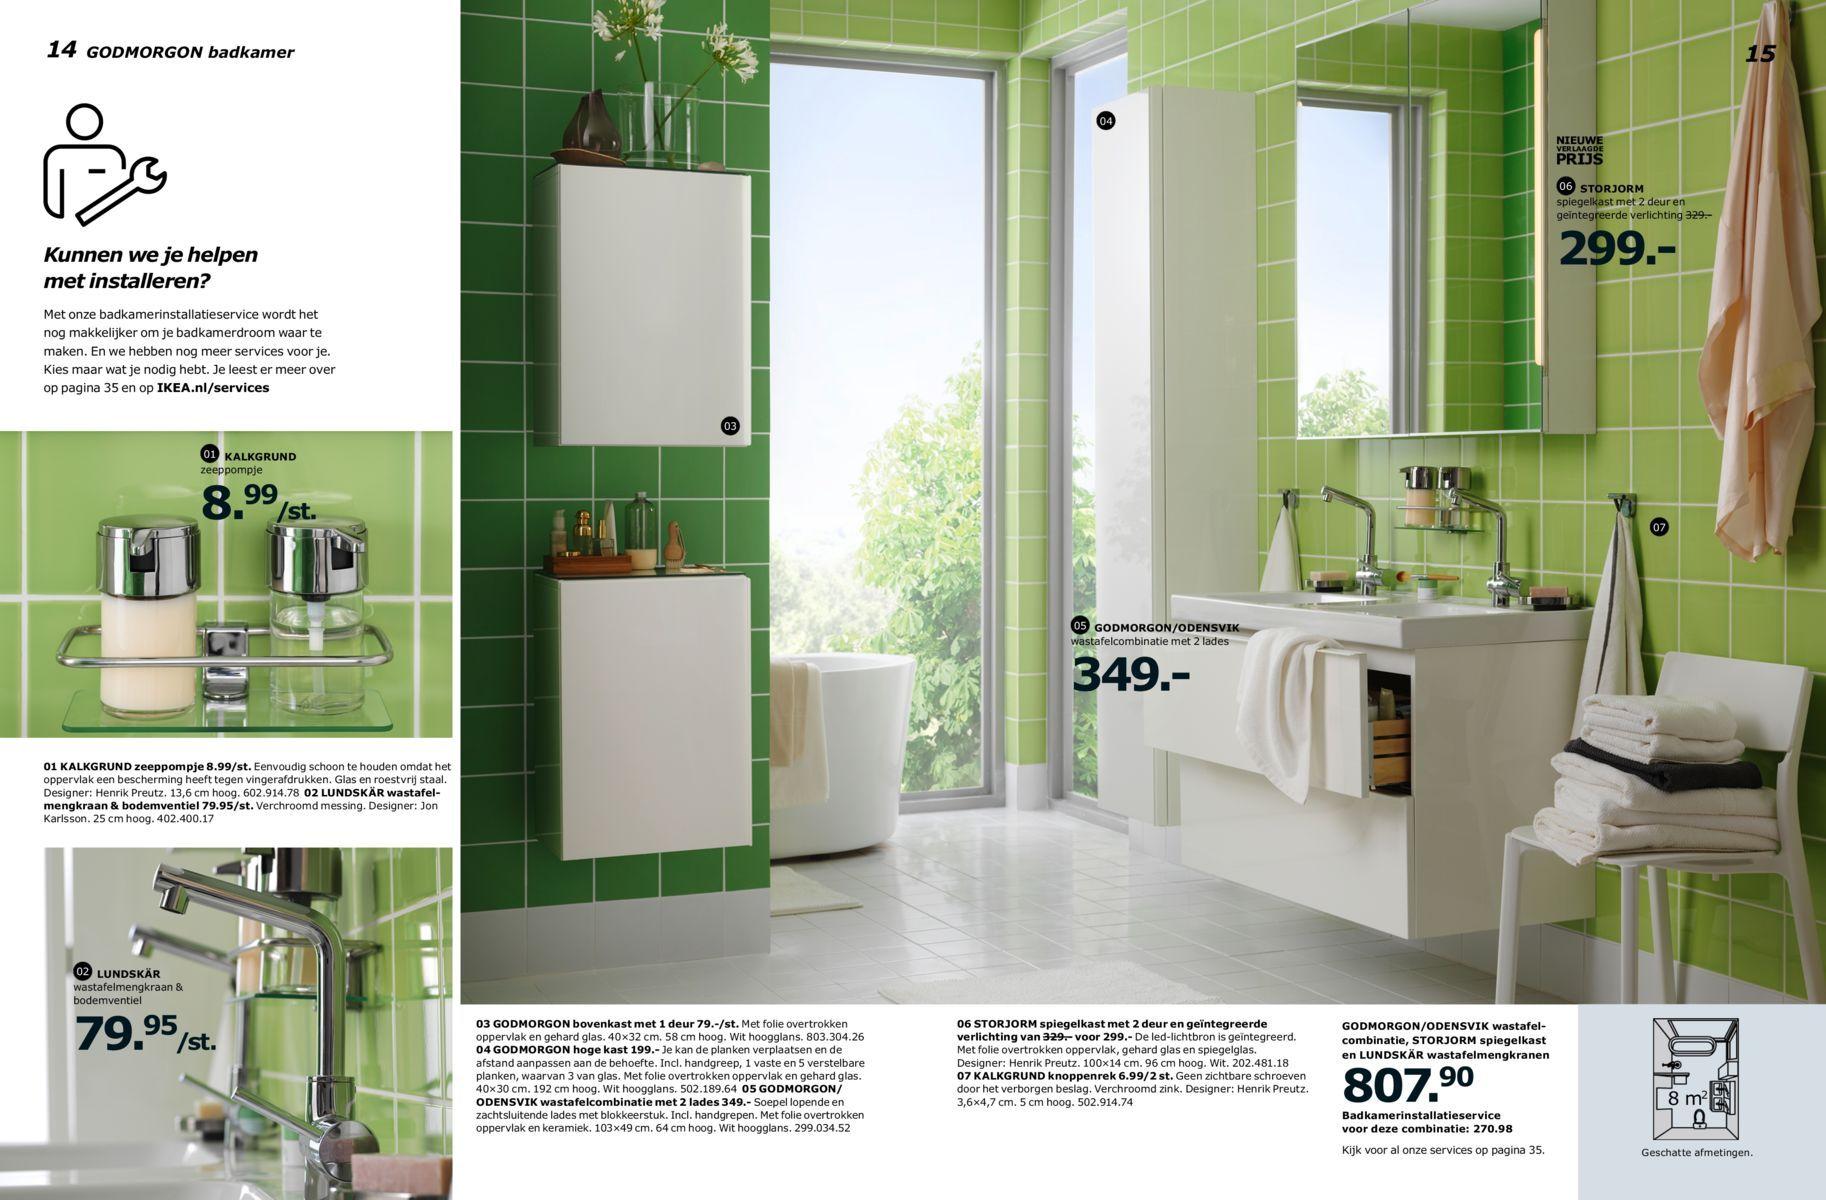 Brochure badkamers | Bathroom | Pinterest | Brochures and Ranges